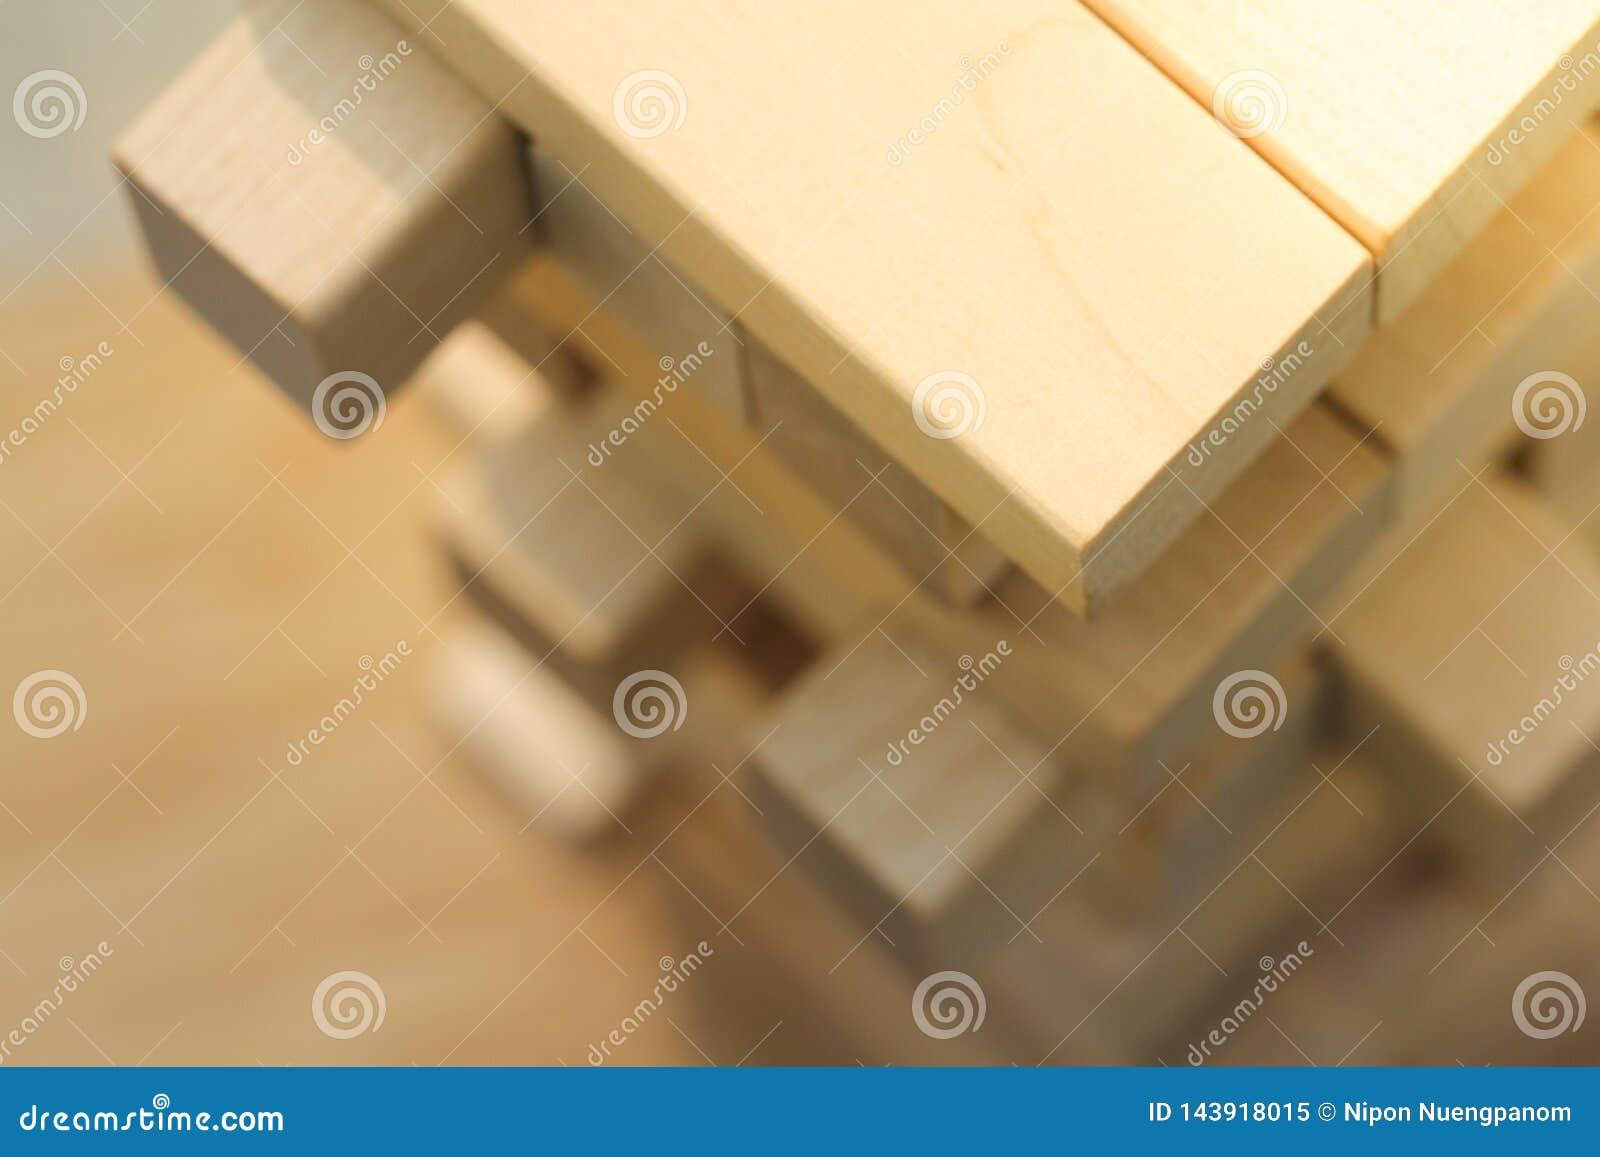 Vista superior del juego de madera de la torre del bloque